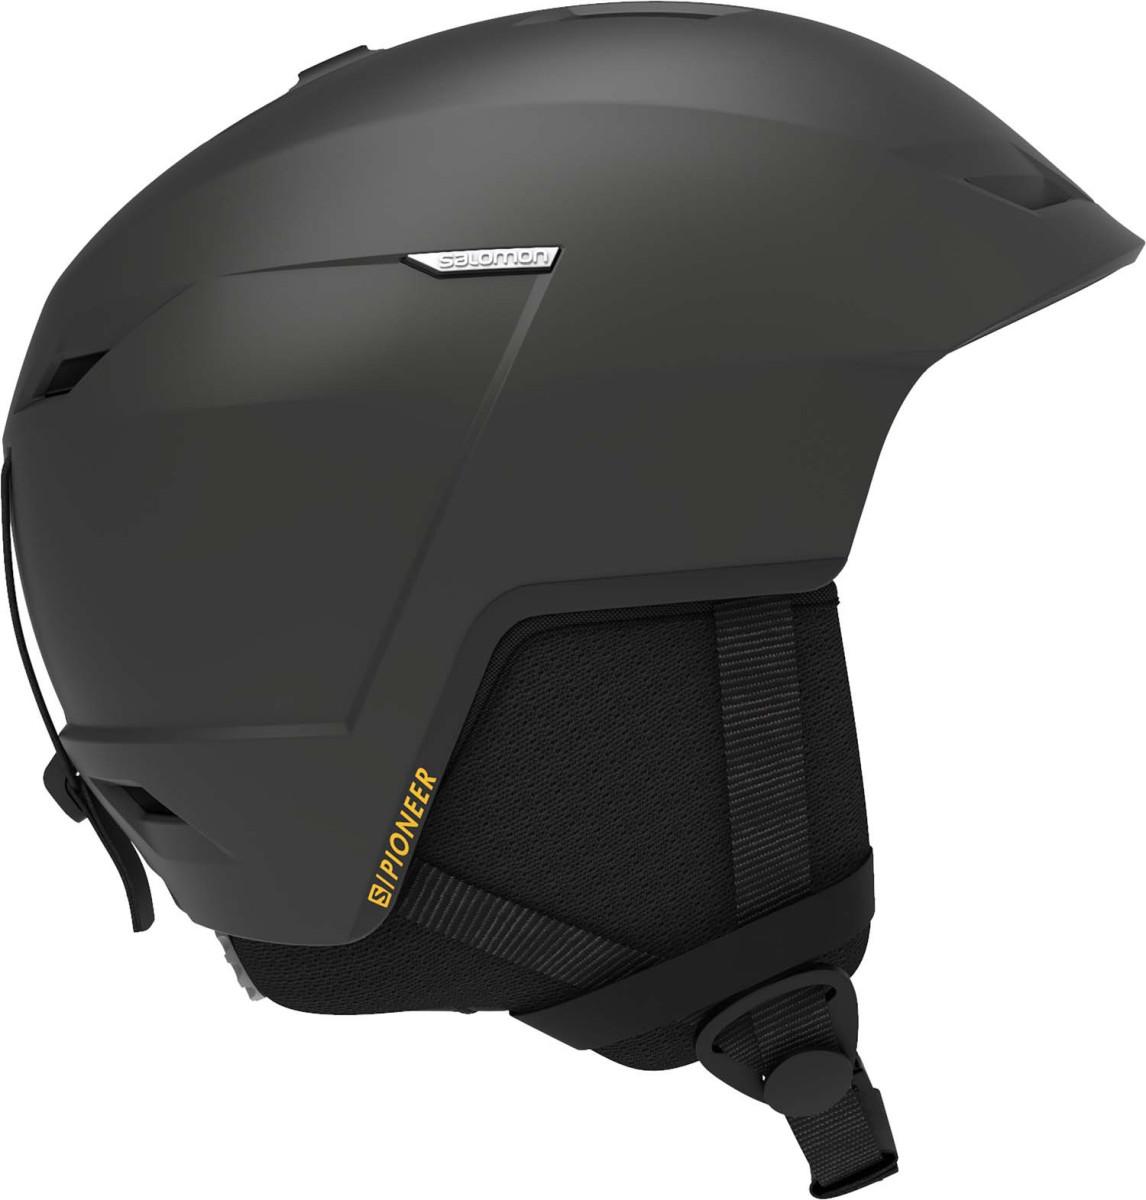 Salomon Pioneer LT - šedá 2020/2021.